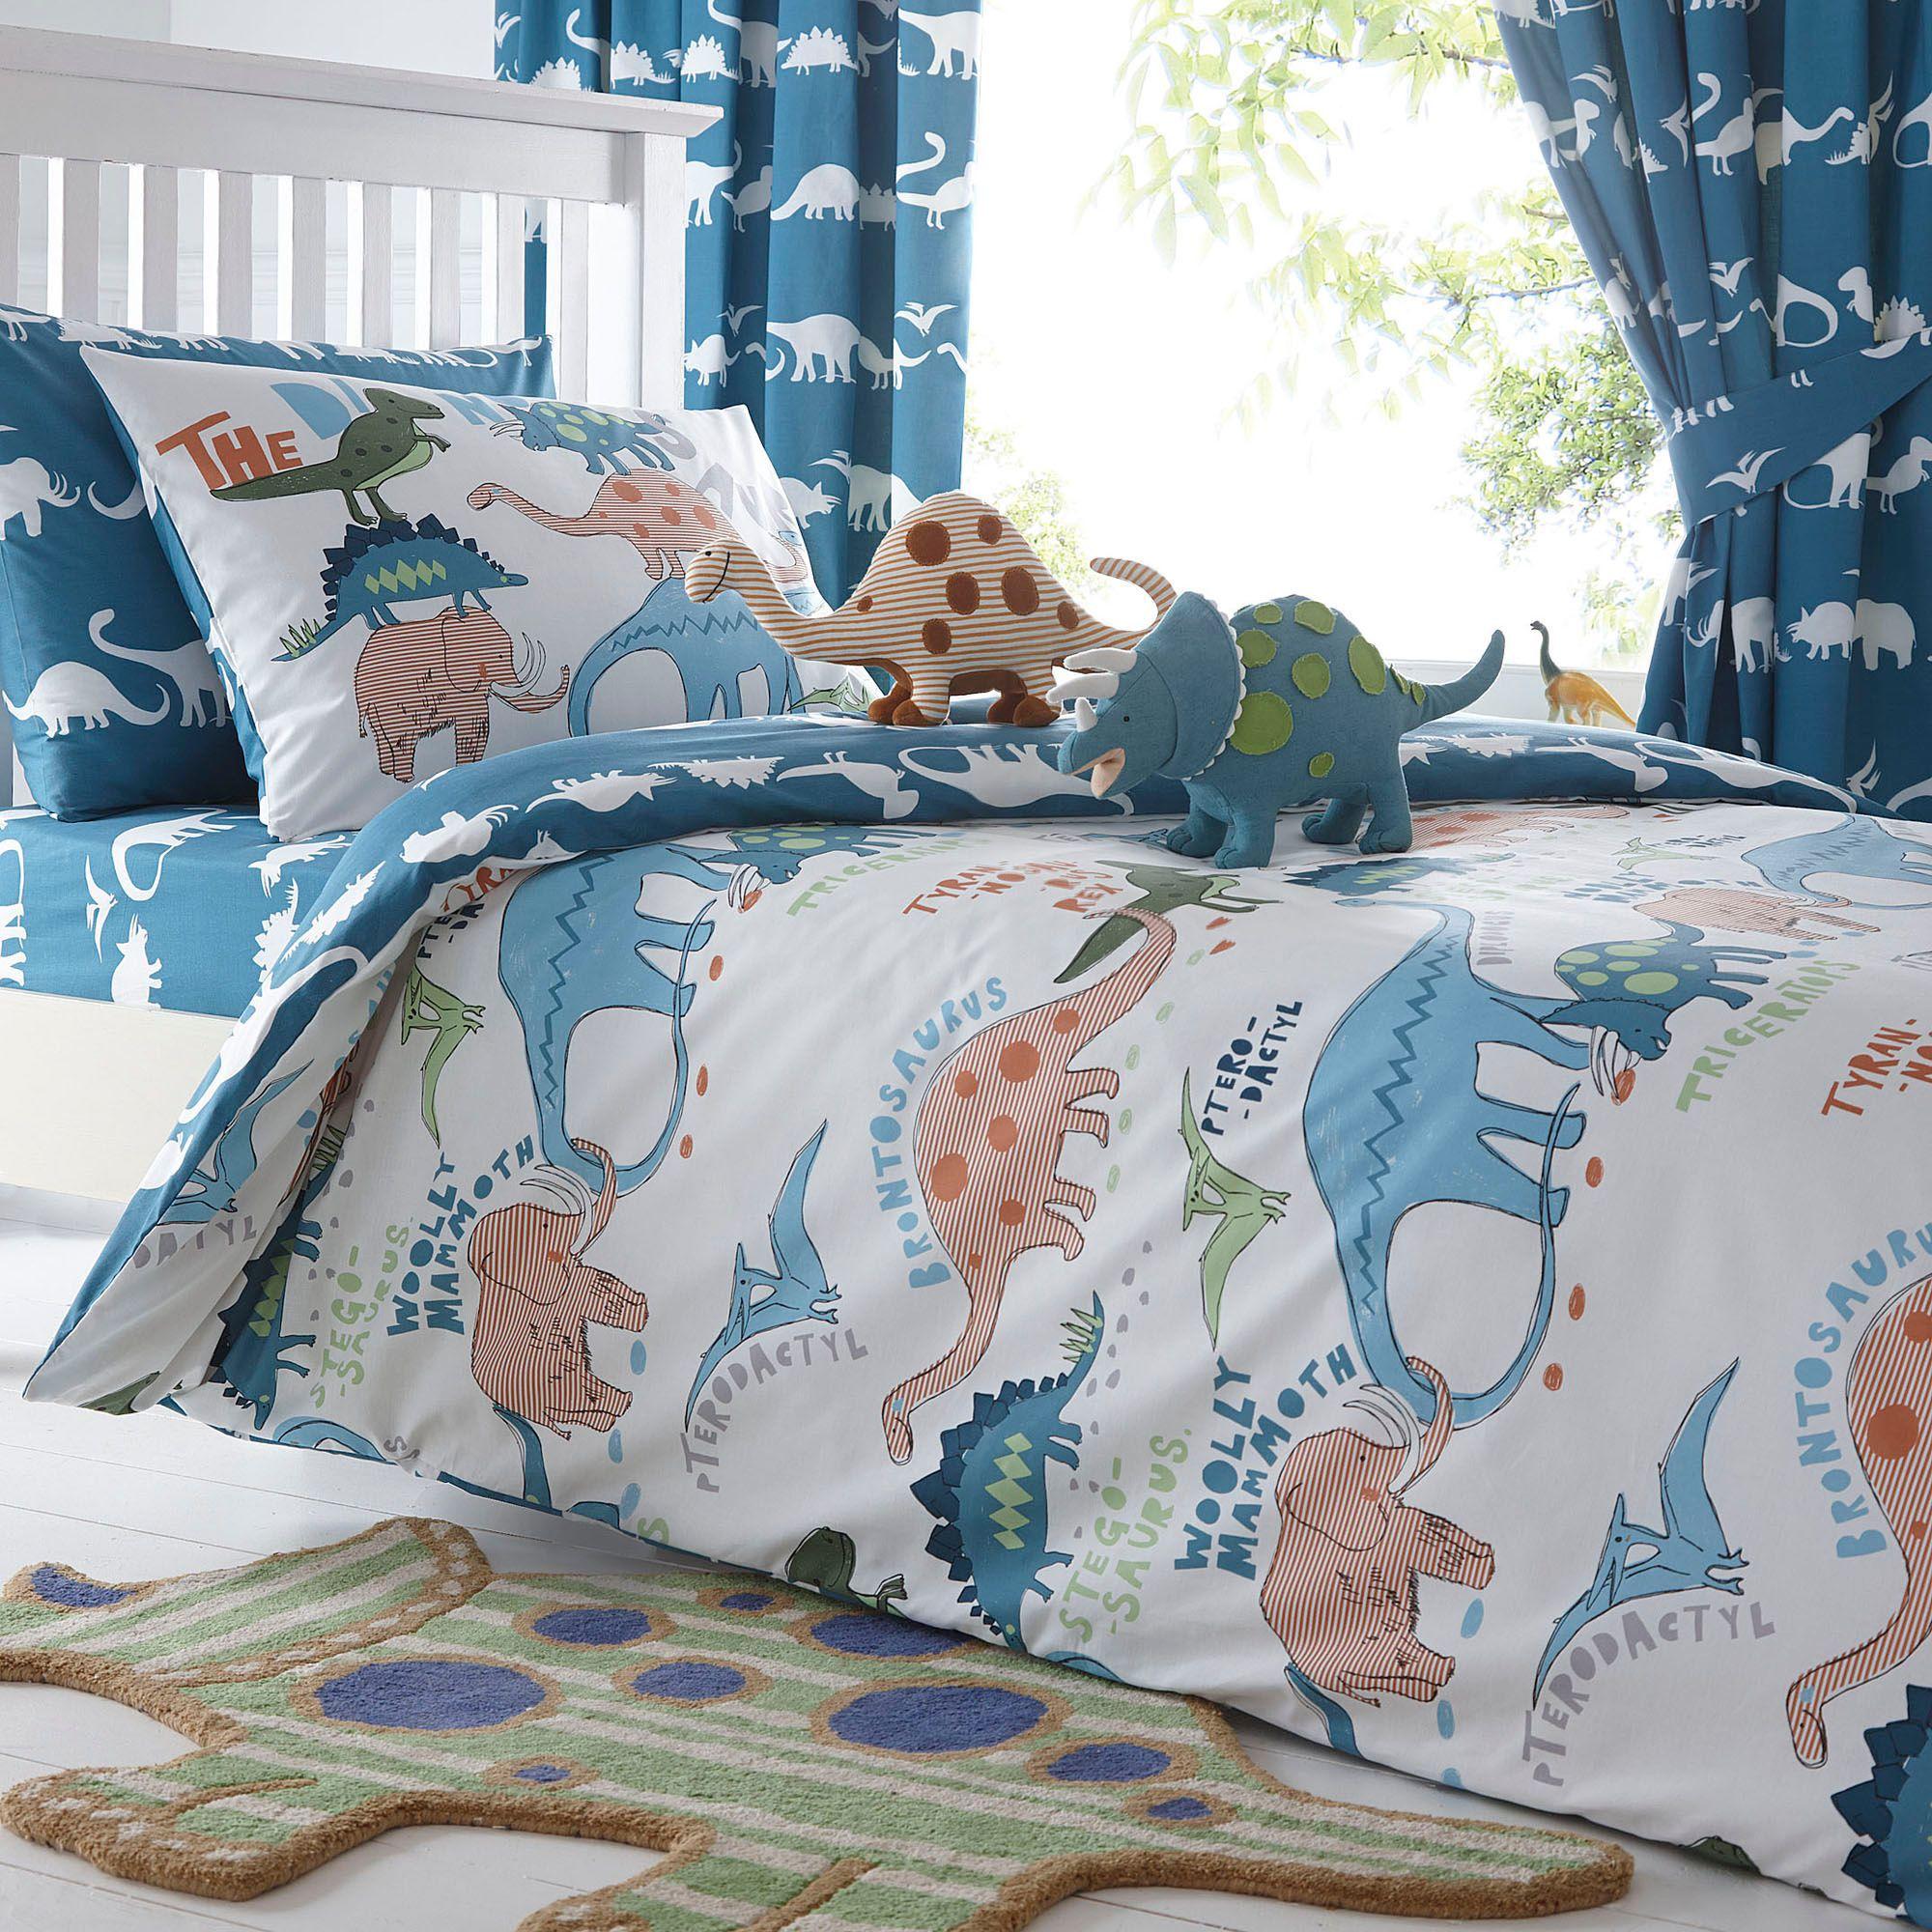 bluezoo kids 39 blue dinosaur print duvet cover and pillow. Black Bedroom Furniture Sets. Home Design Ideas